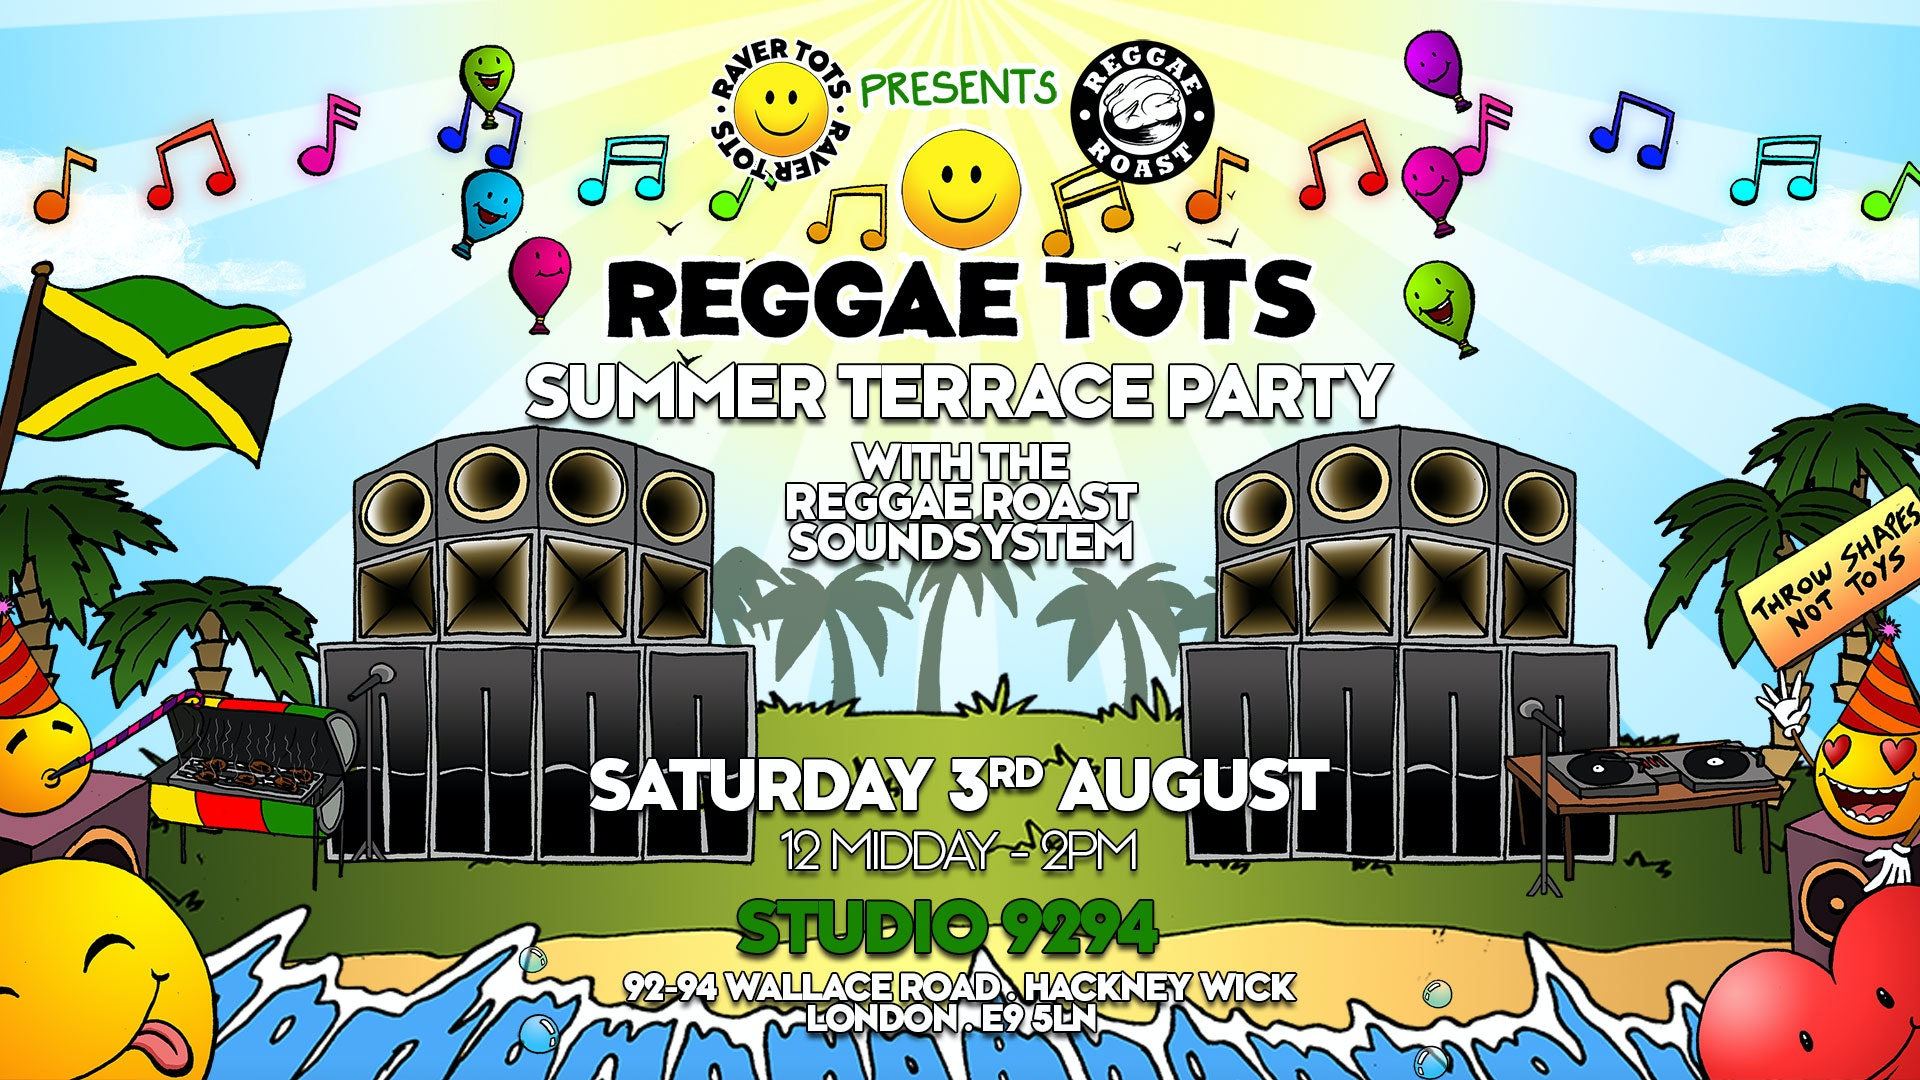 Reggae Tots Summer Terrace Party!